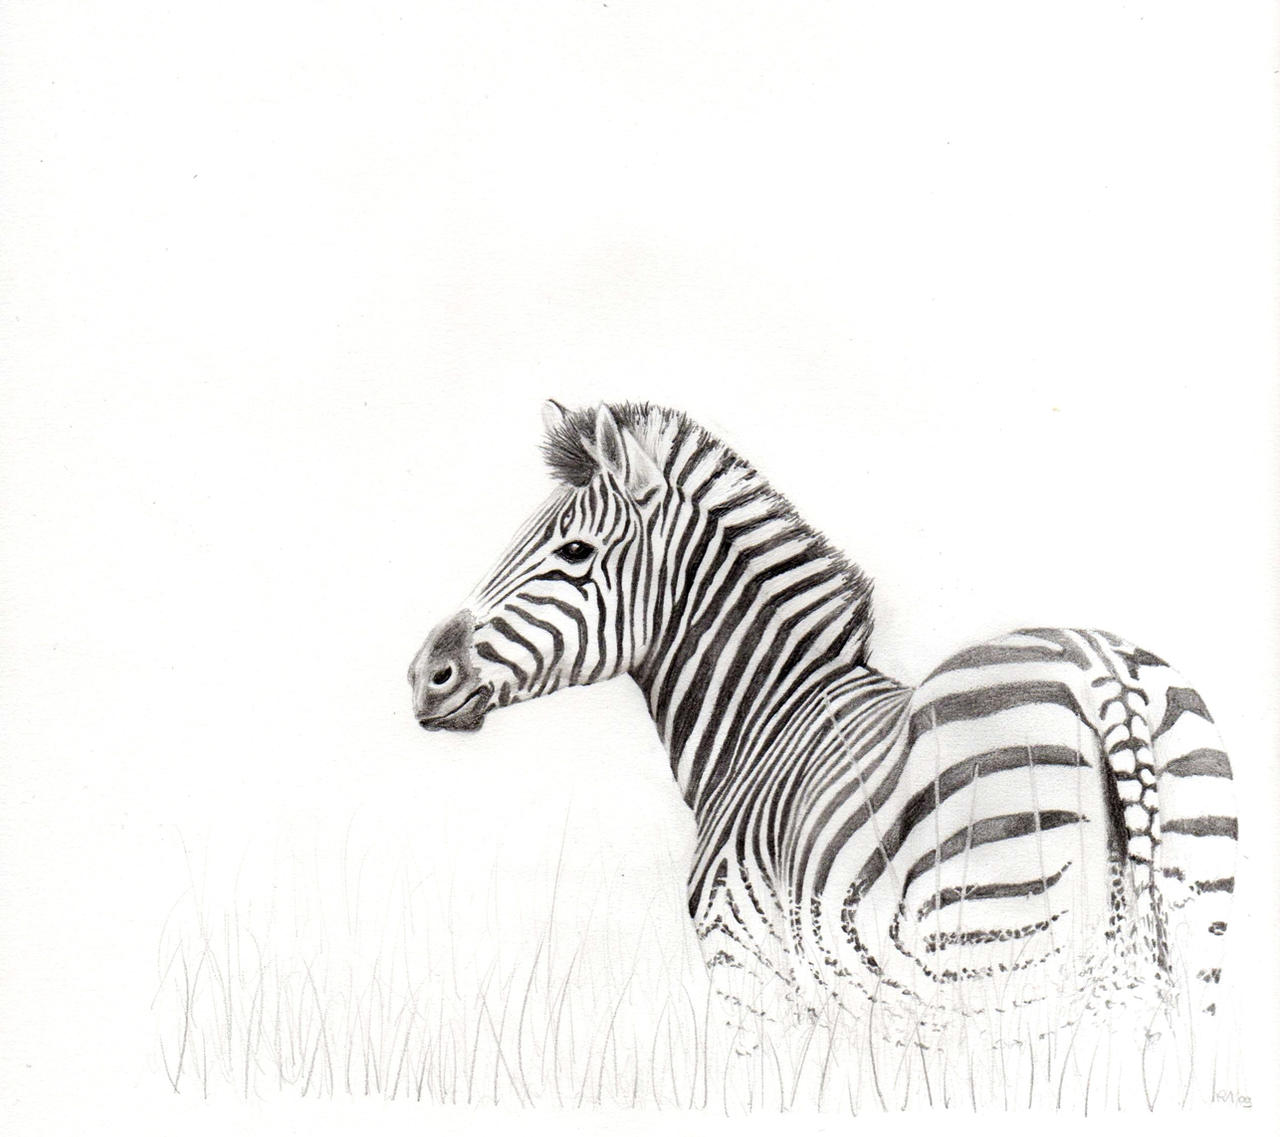 zebra pencil drawing - photo #18